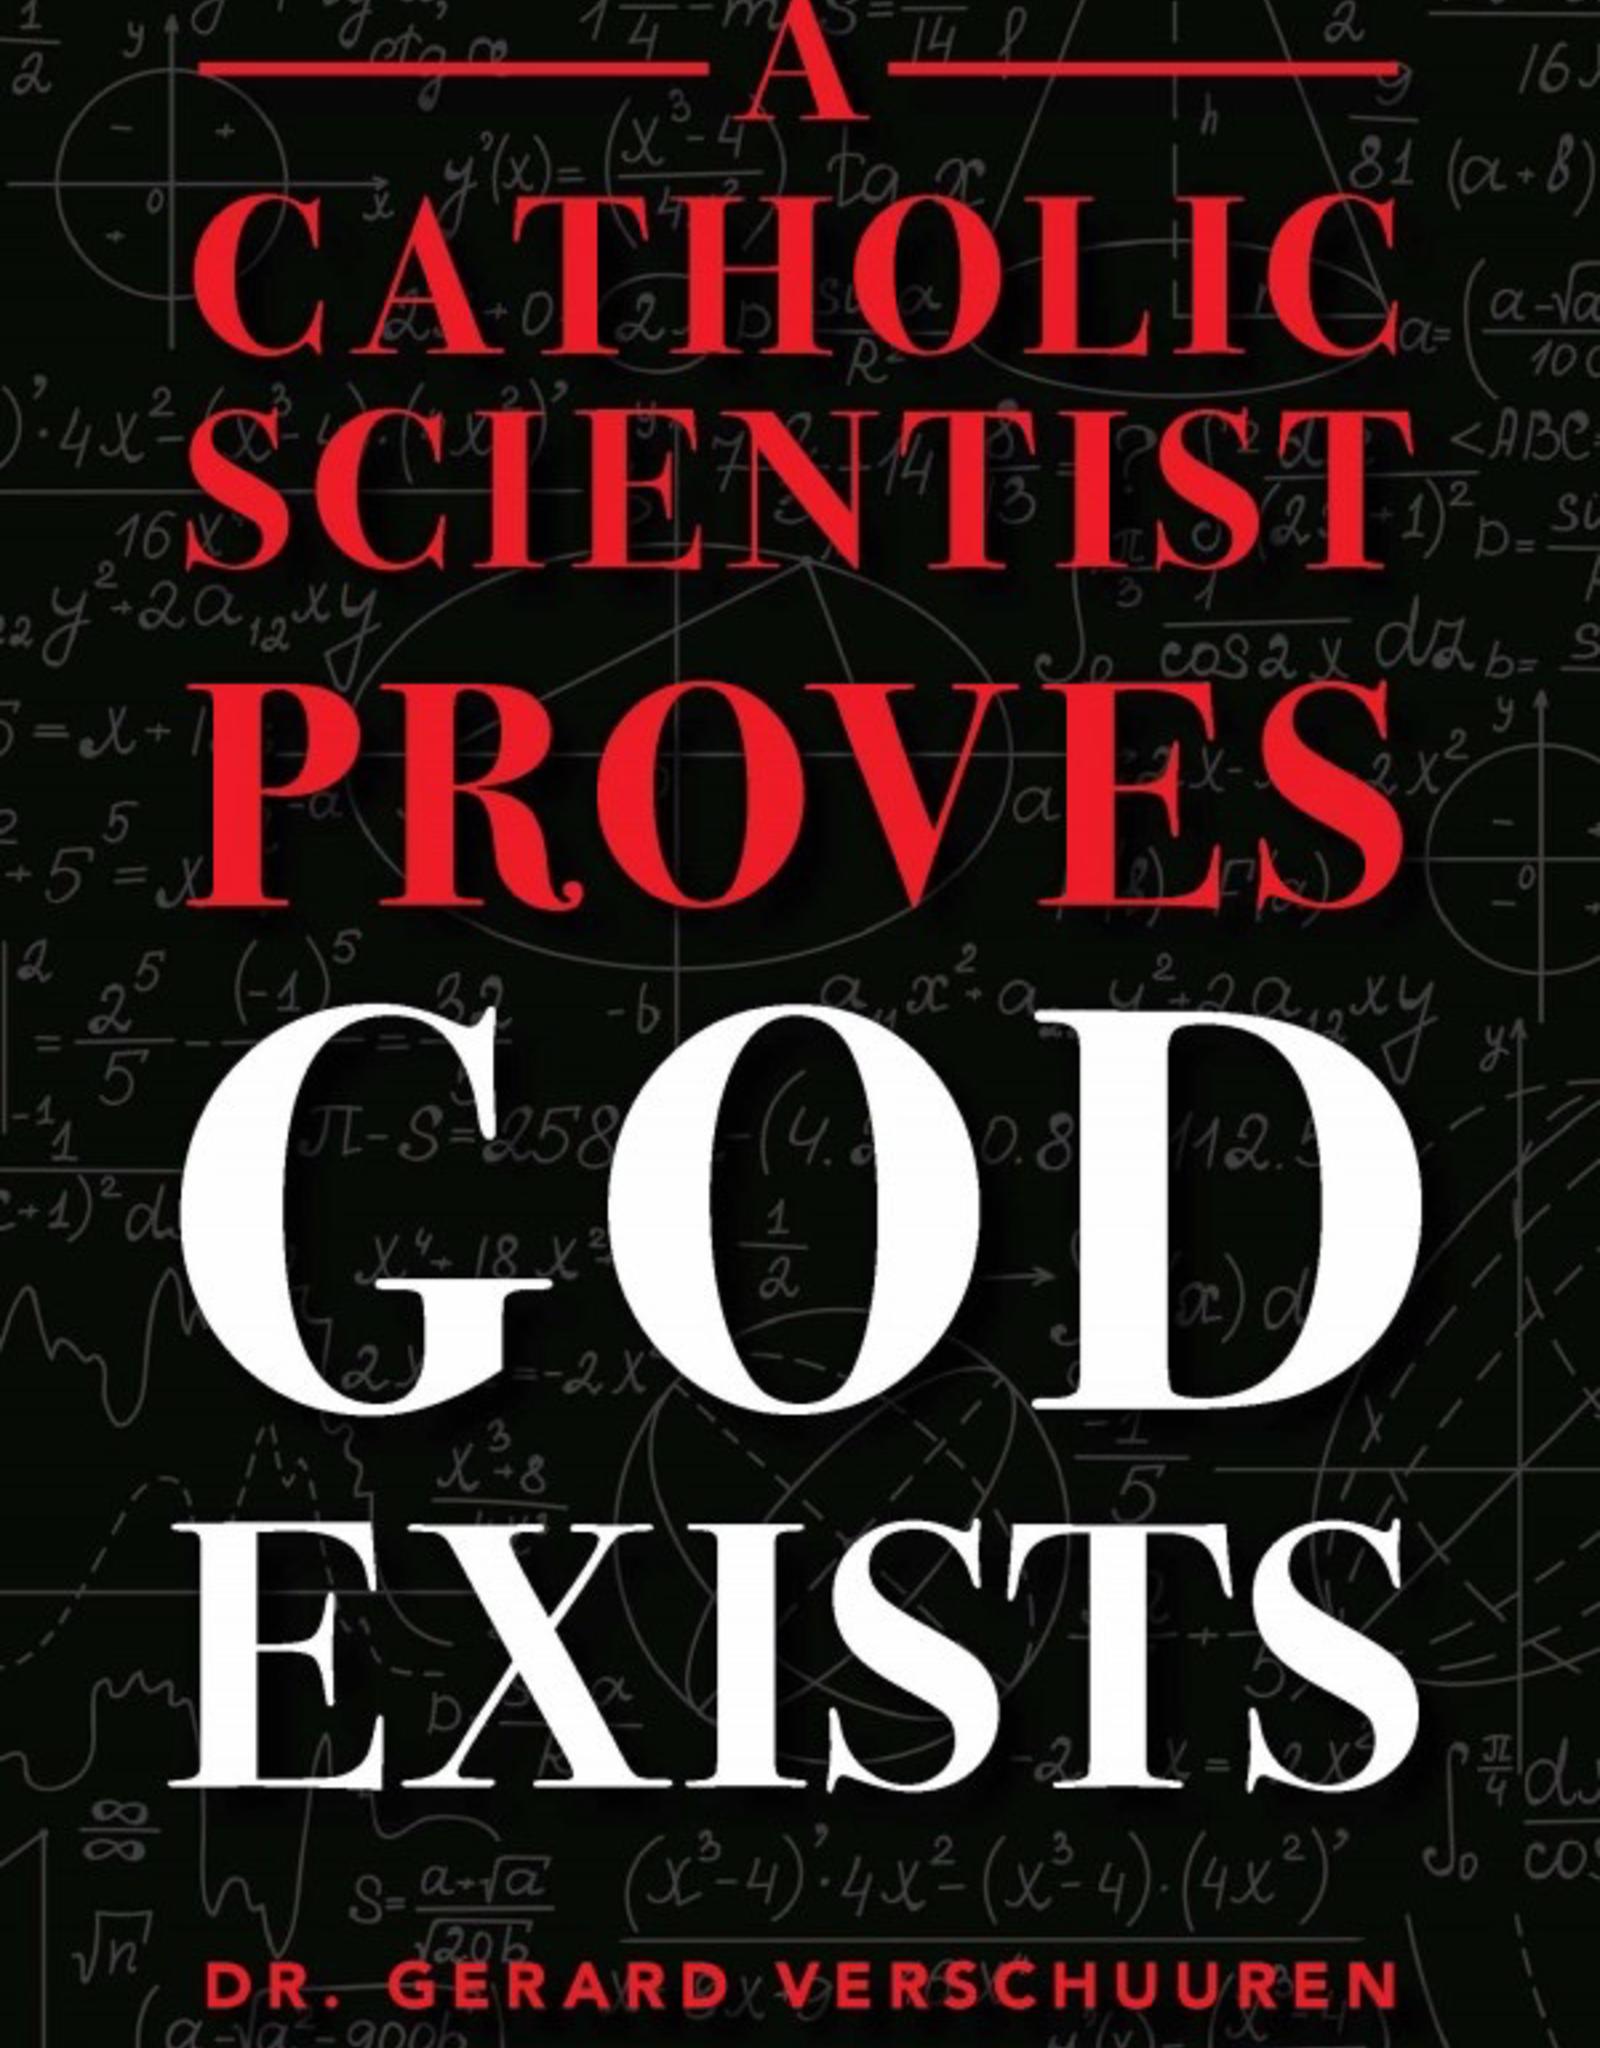 Sophia Institute A Catholic Scientist Proves God Exists, by Gerard Verschuuren (paperback)